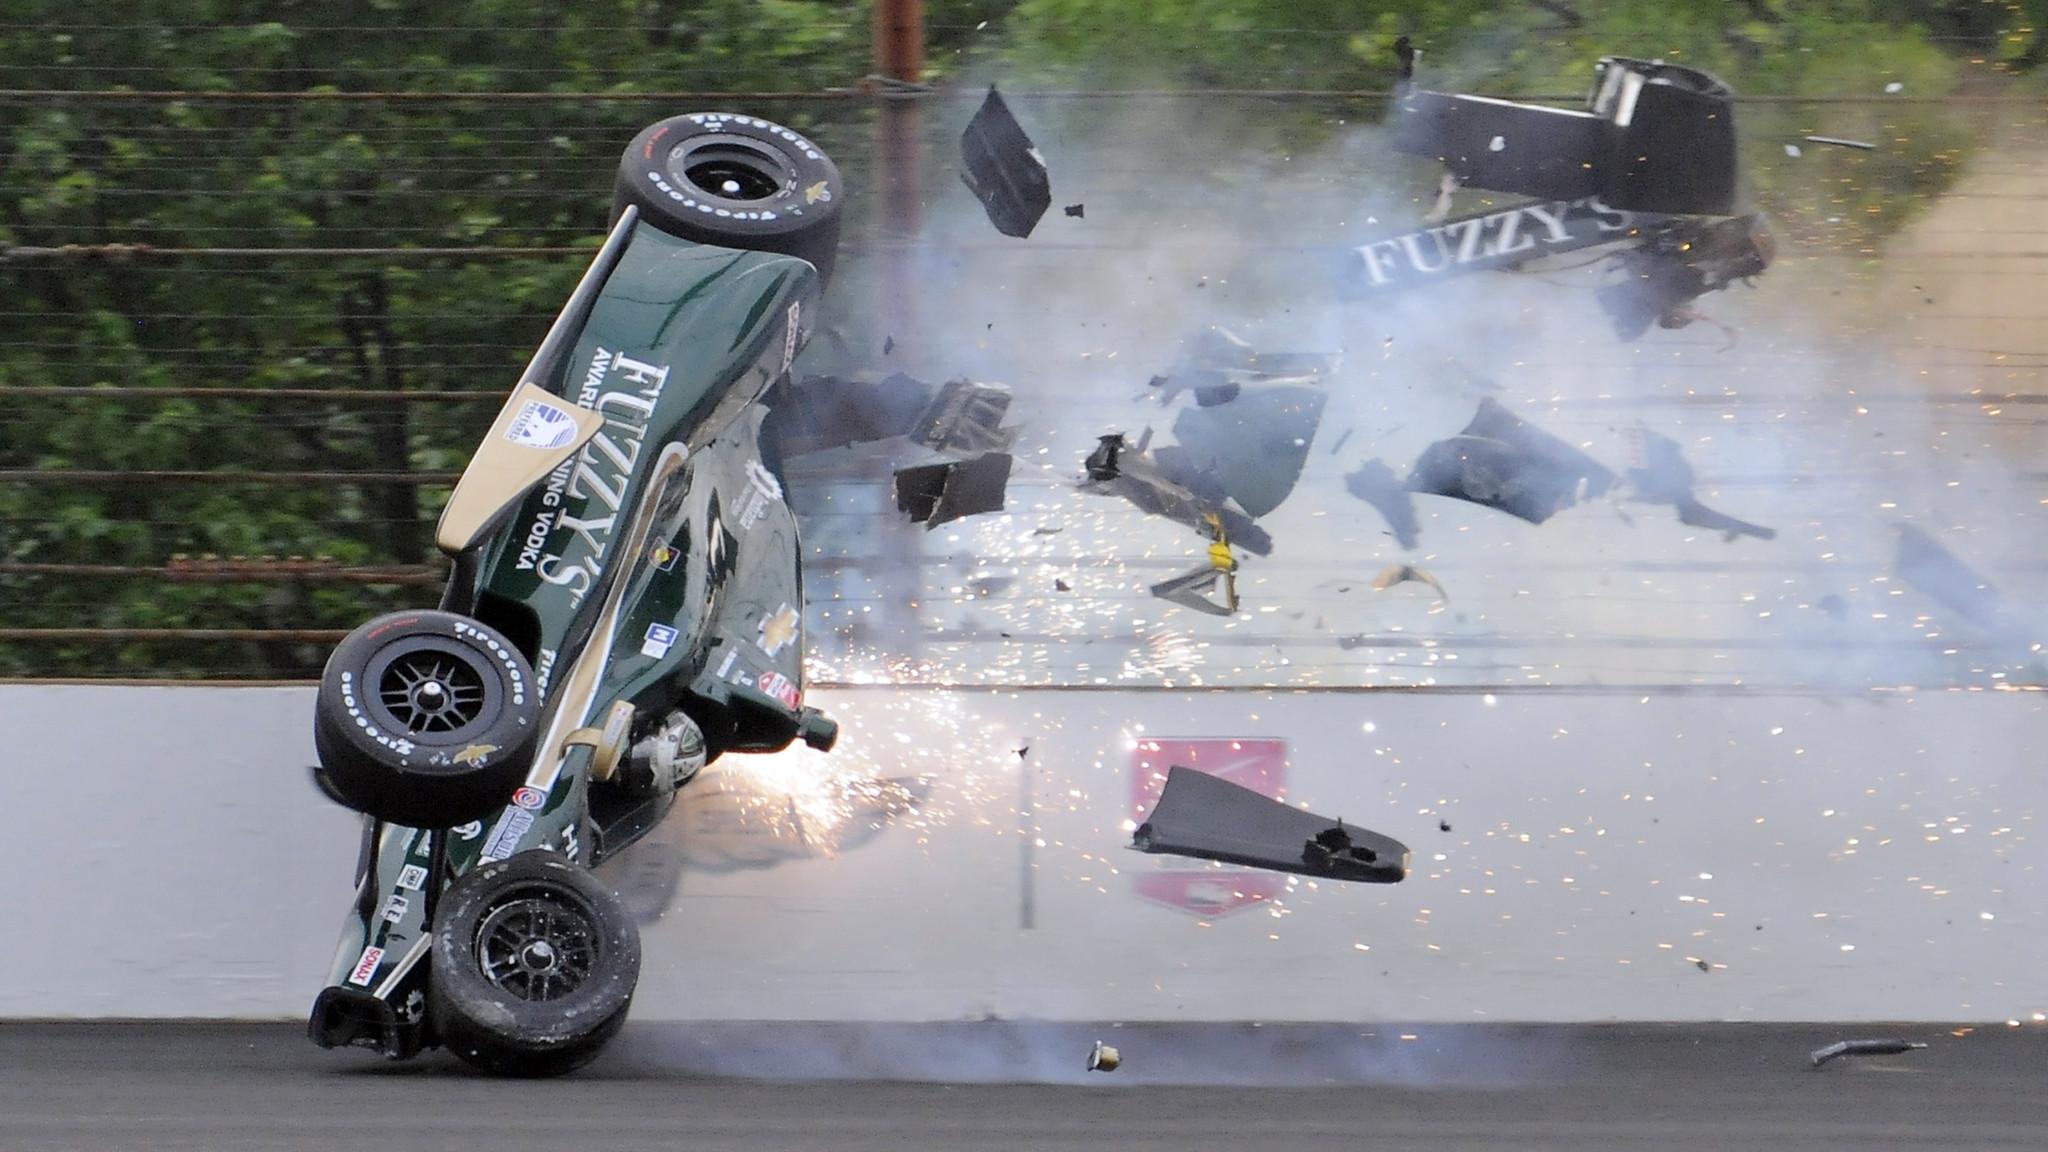 Best Cars 2018 >> Ed Carpenter crashes at Indianapolis Motor Speedway - Chicago Tribune